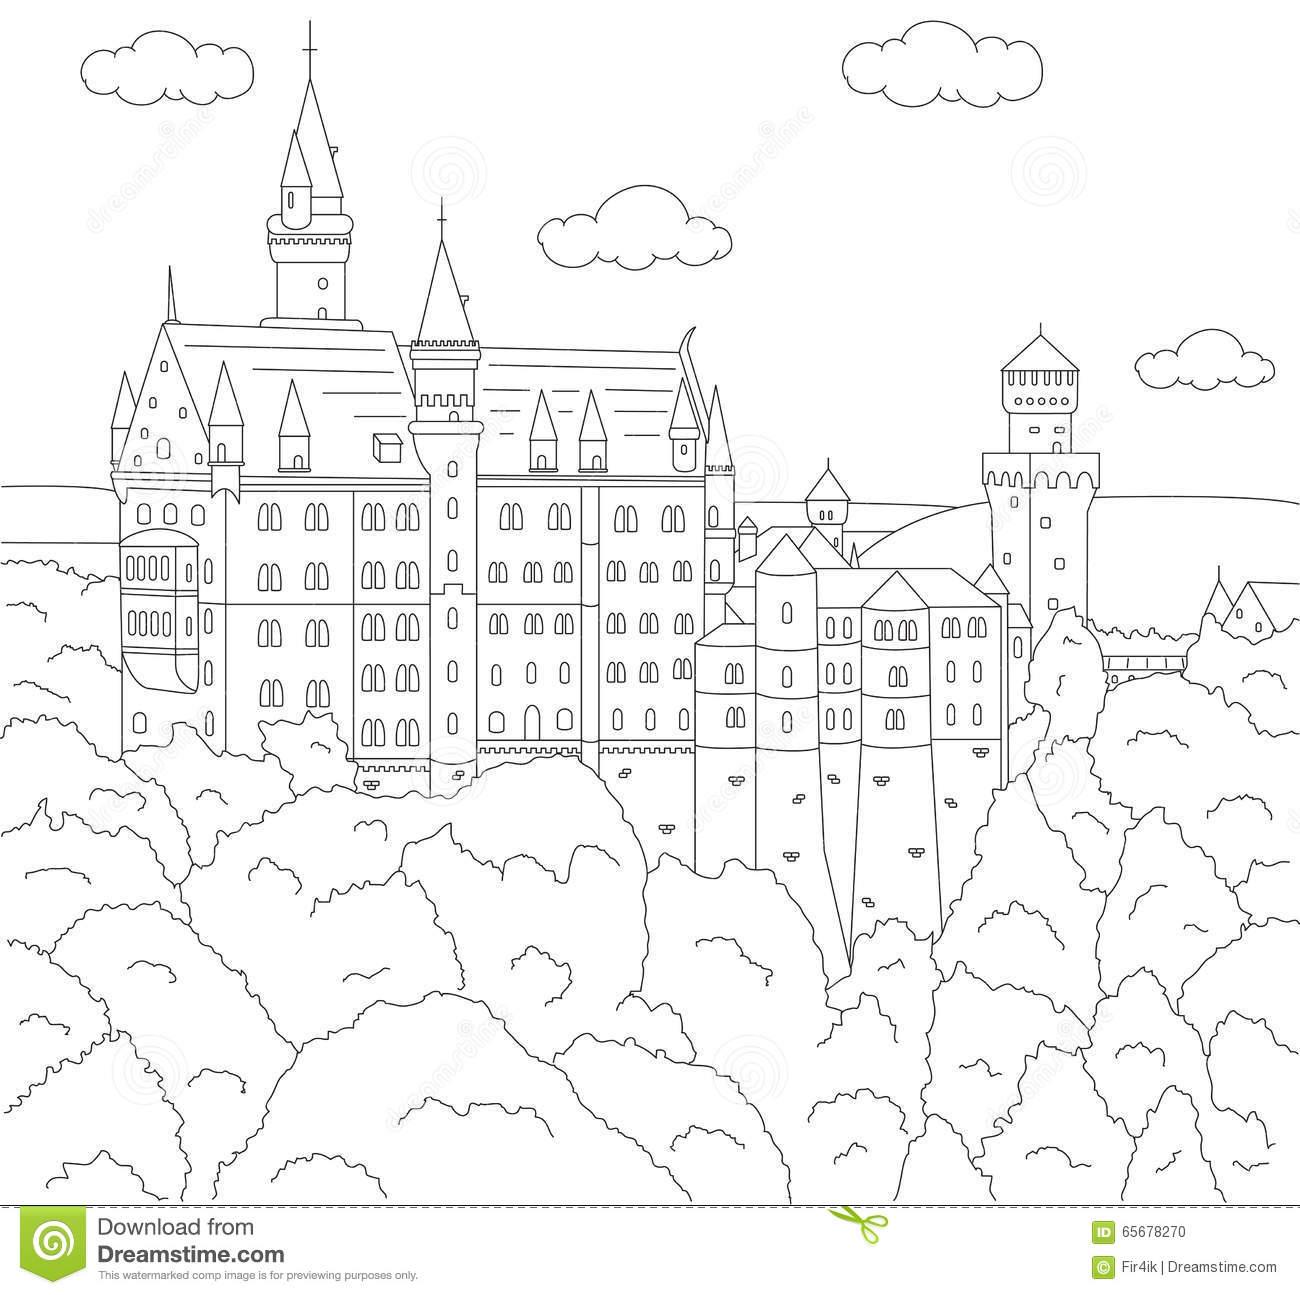 Neuschwanstein Castle coloring #5, Download drawings